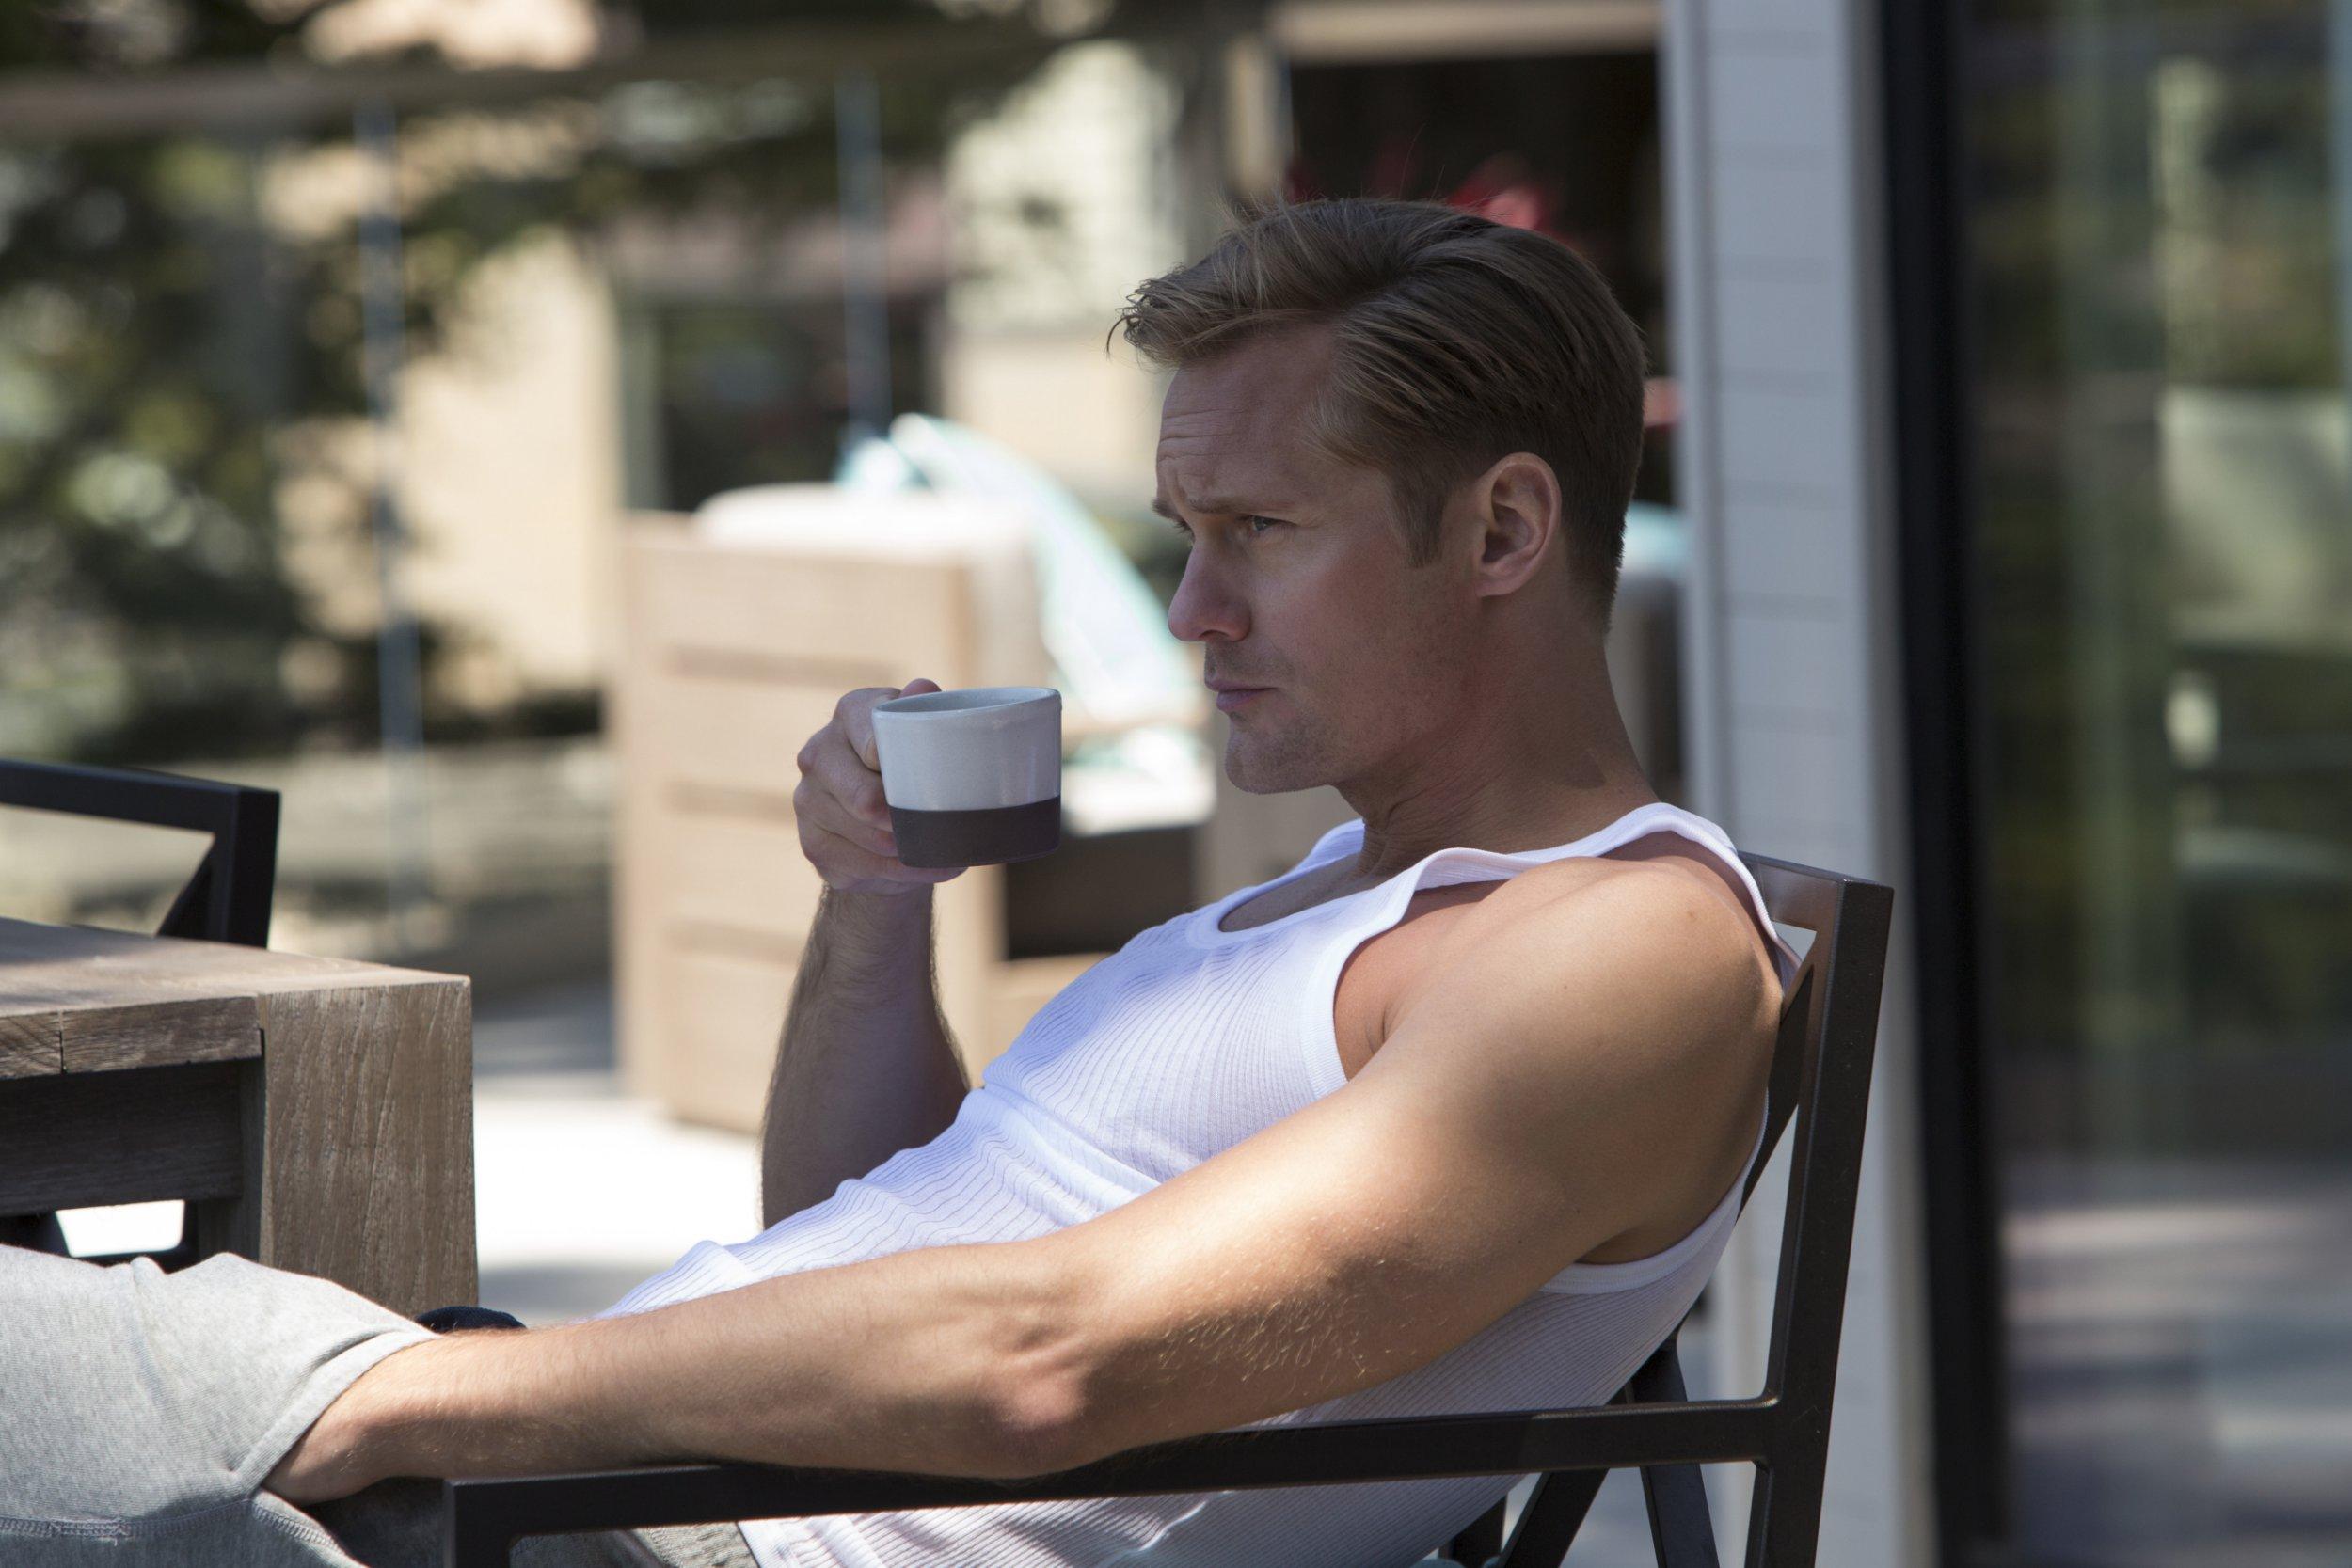 Alexander Skarsgard gives huge hint he's returning for Big Little Lies season 2